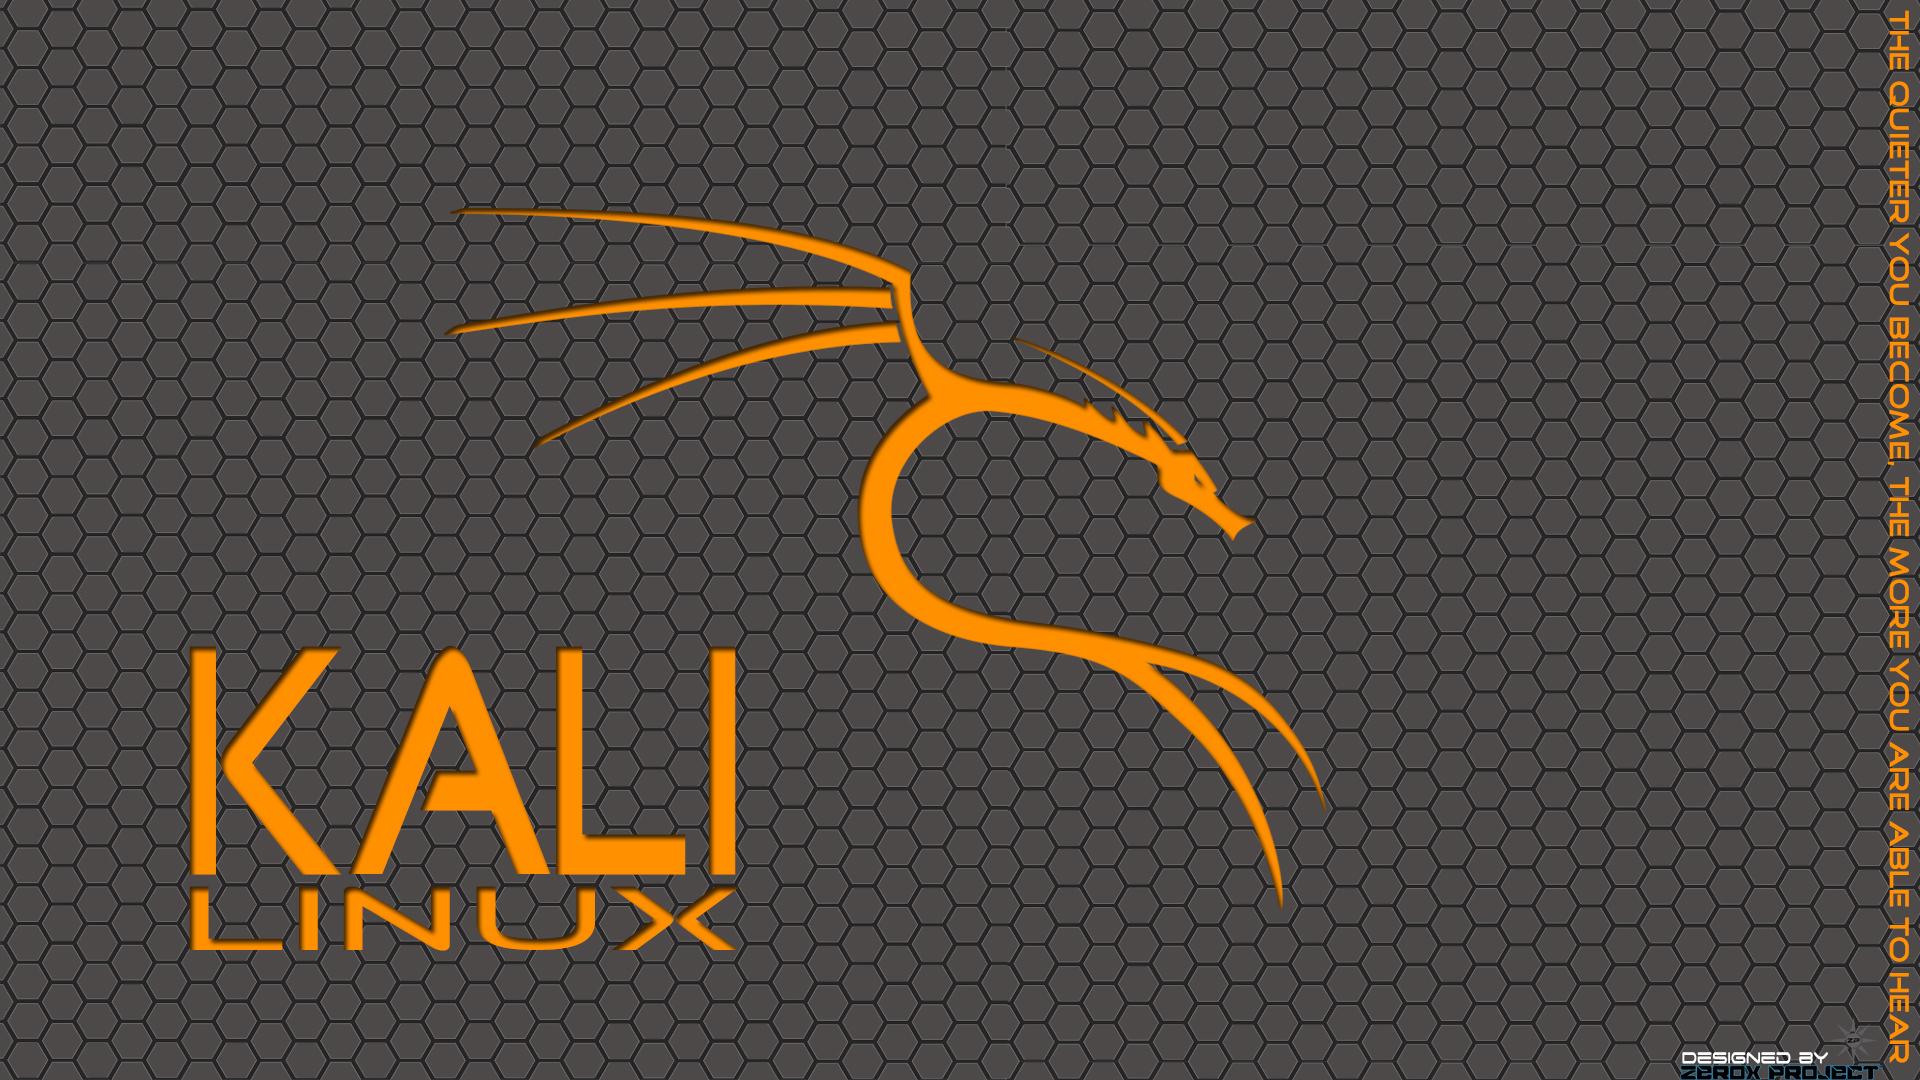 Kali Linux Wallpaper Kali linux backtrack   the 1920x1080